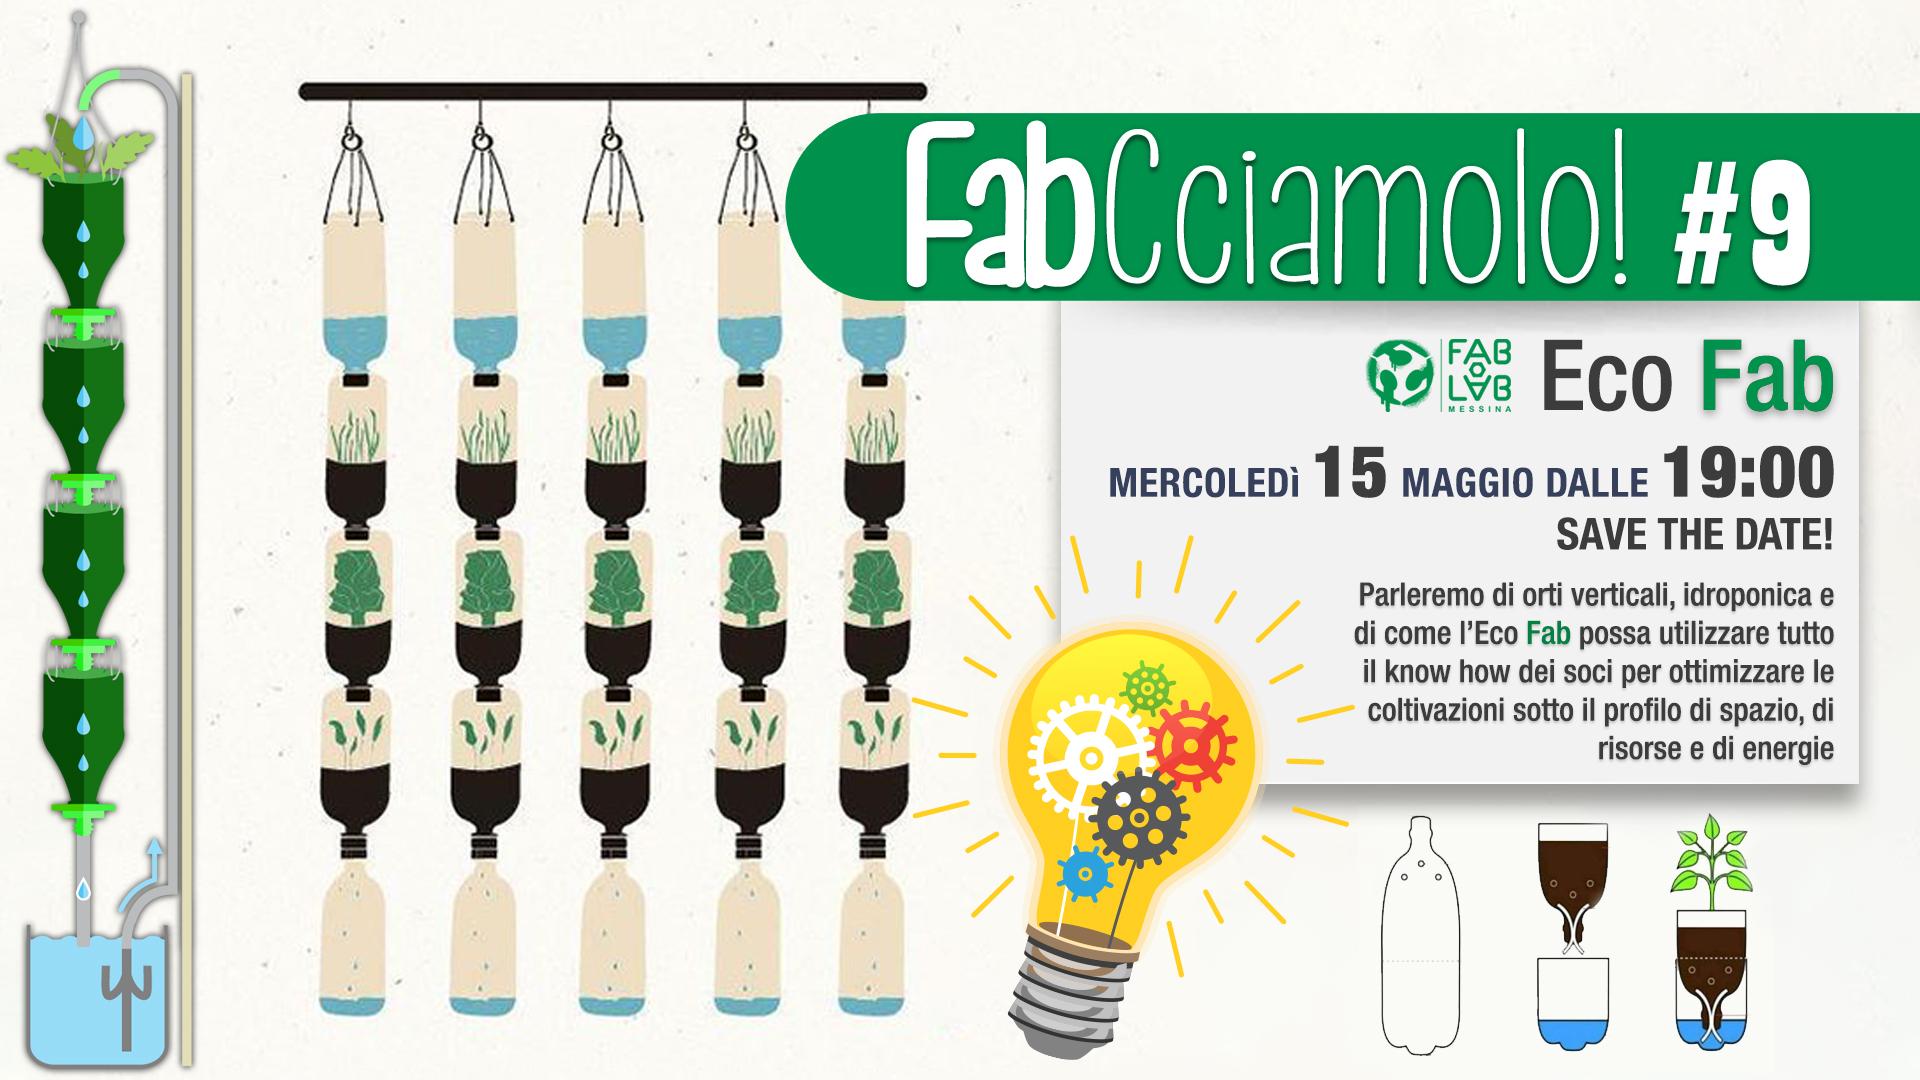 FabCciamolo!#9 – ECO FAB